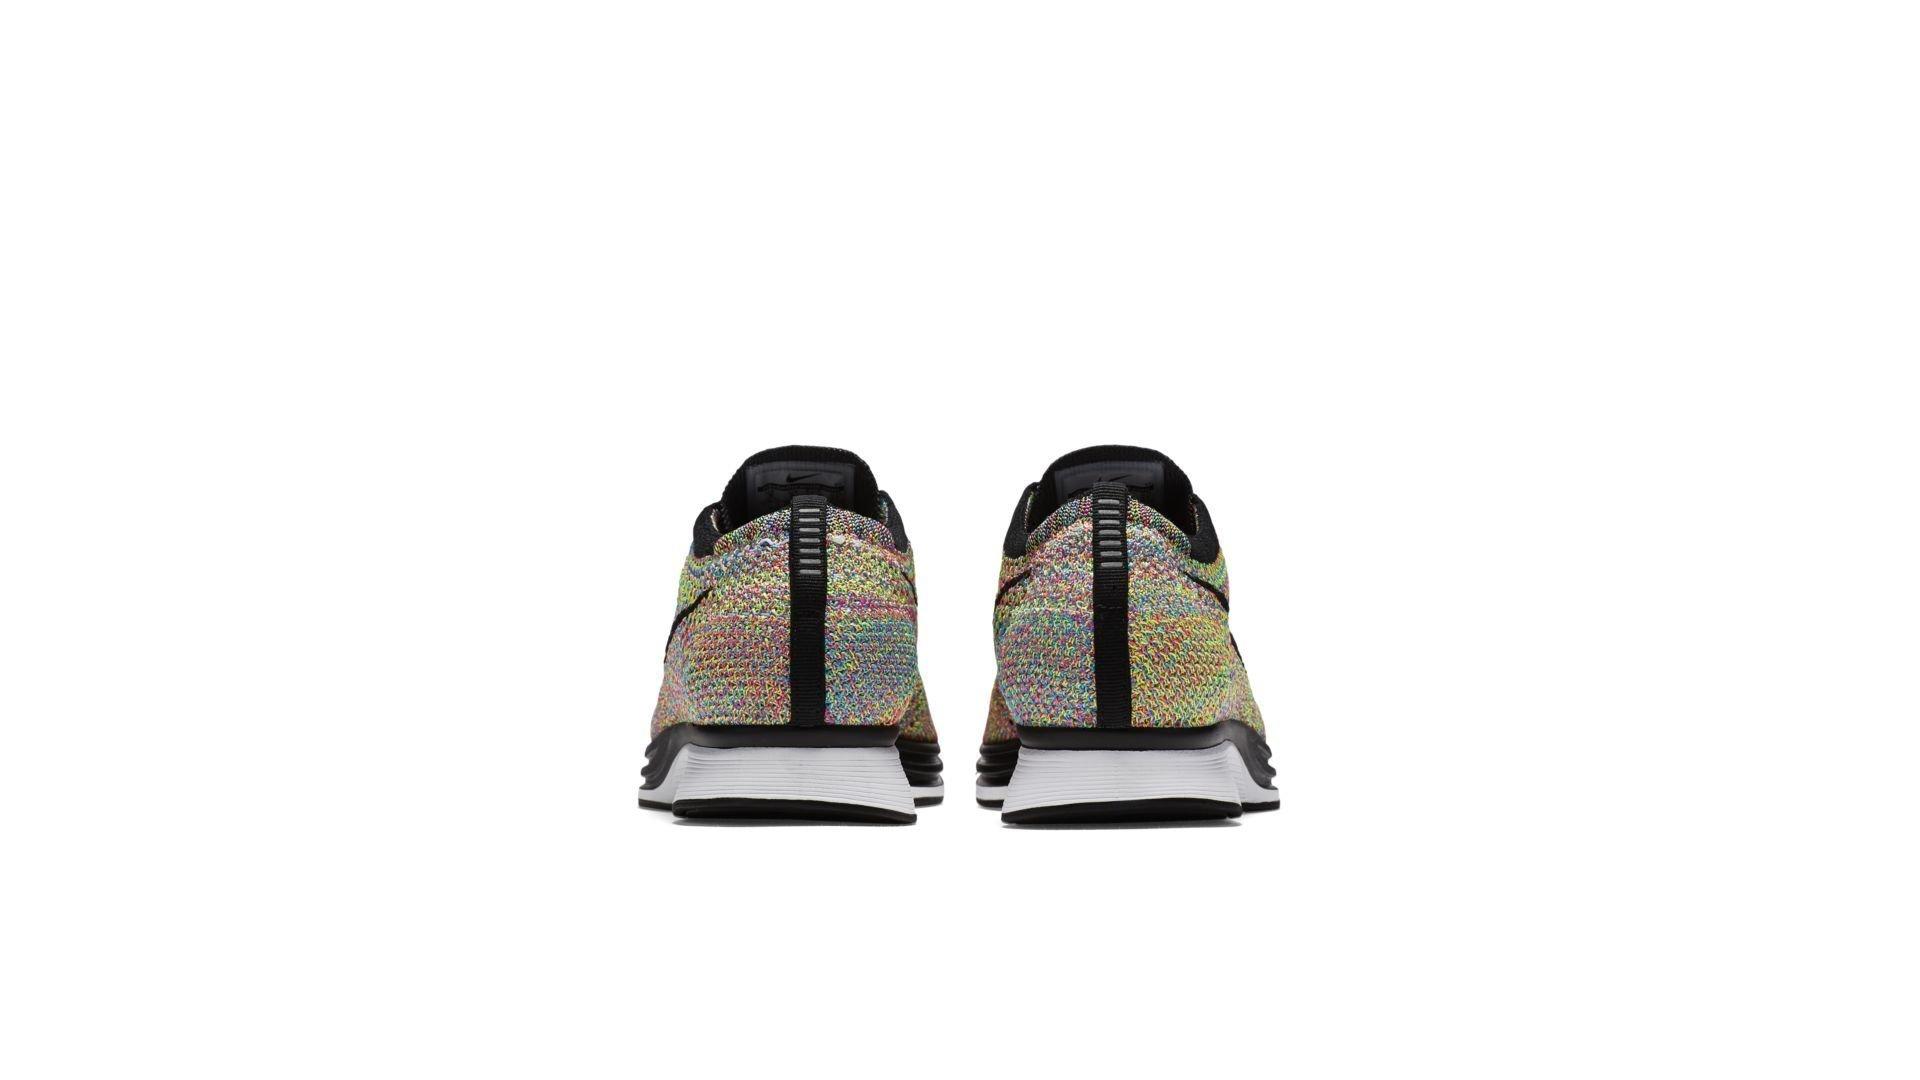 Nike Flyknit Racer Multi-Color 3.0 (2016) (526628-004)